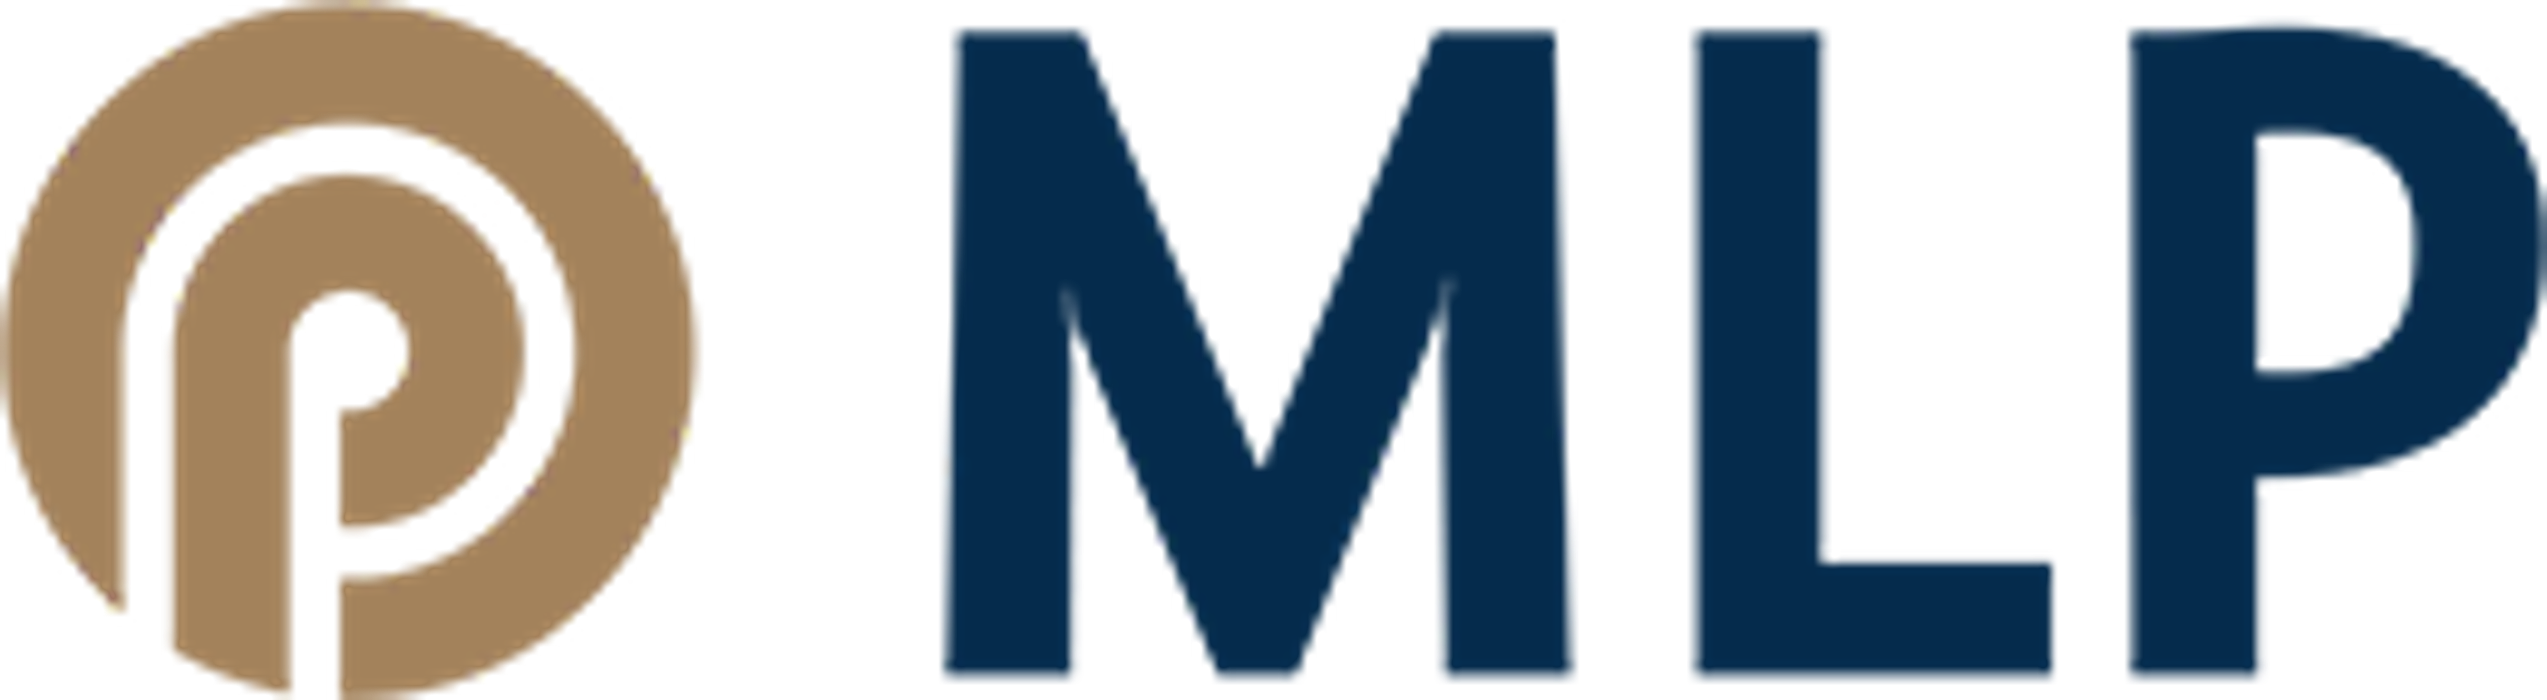 MLP Geschäftsstelle Hannover II